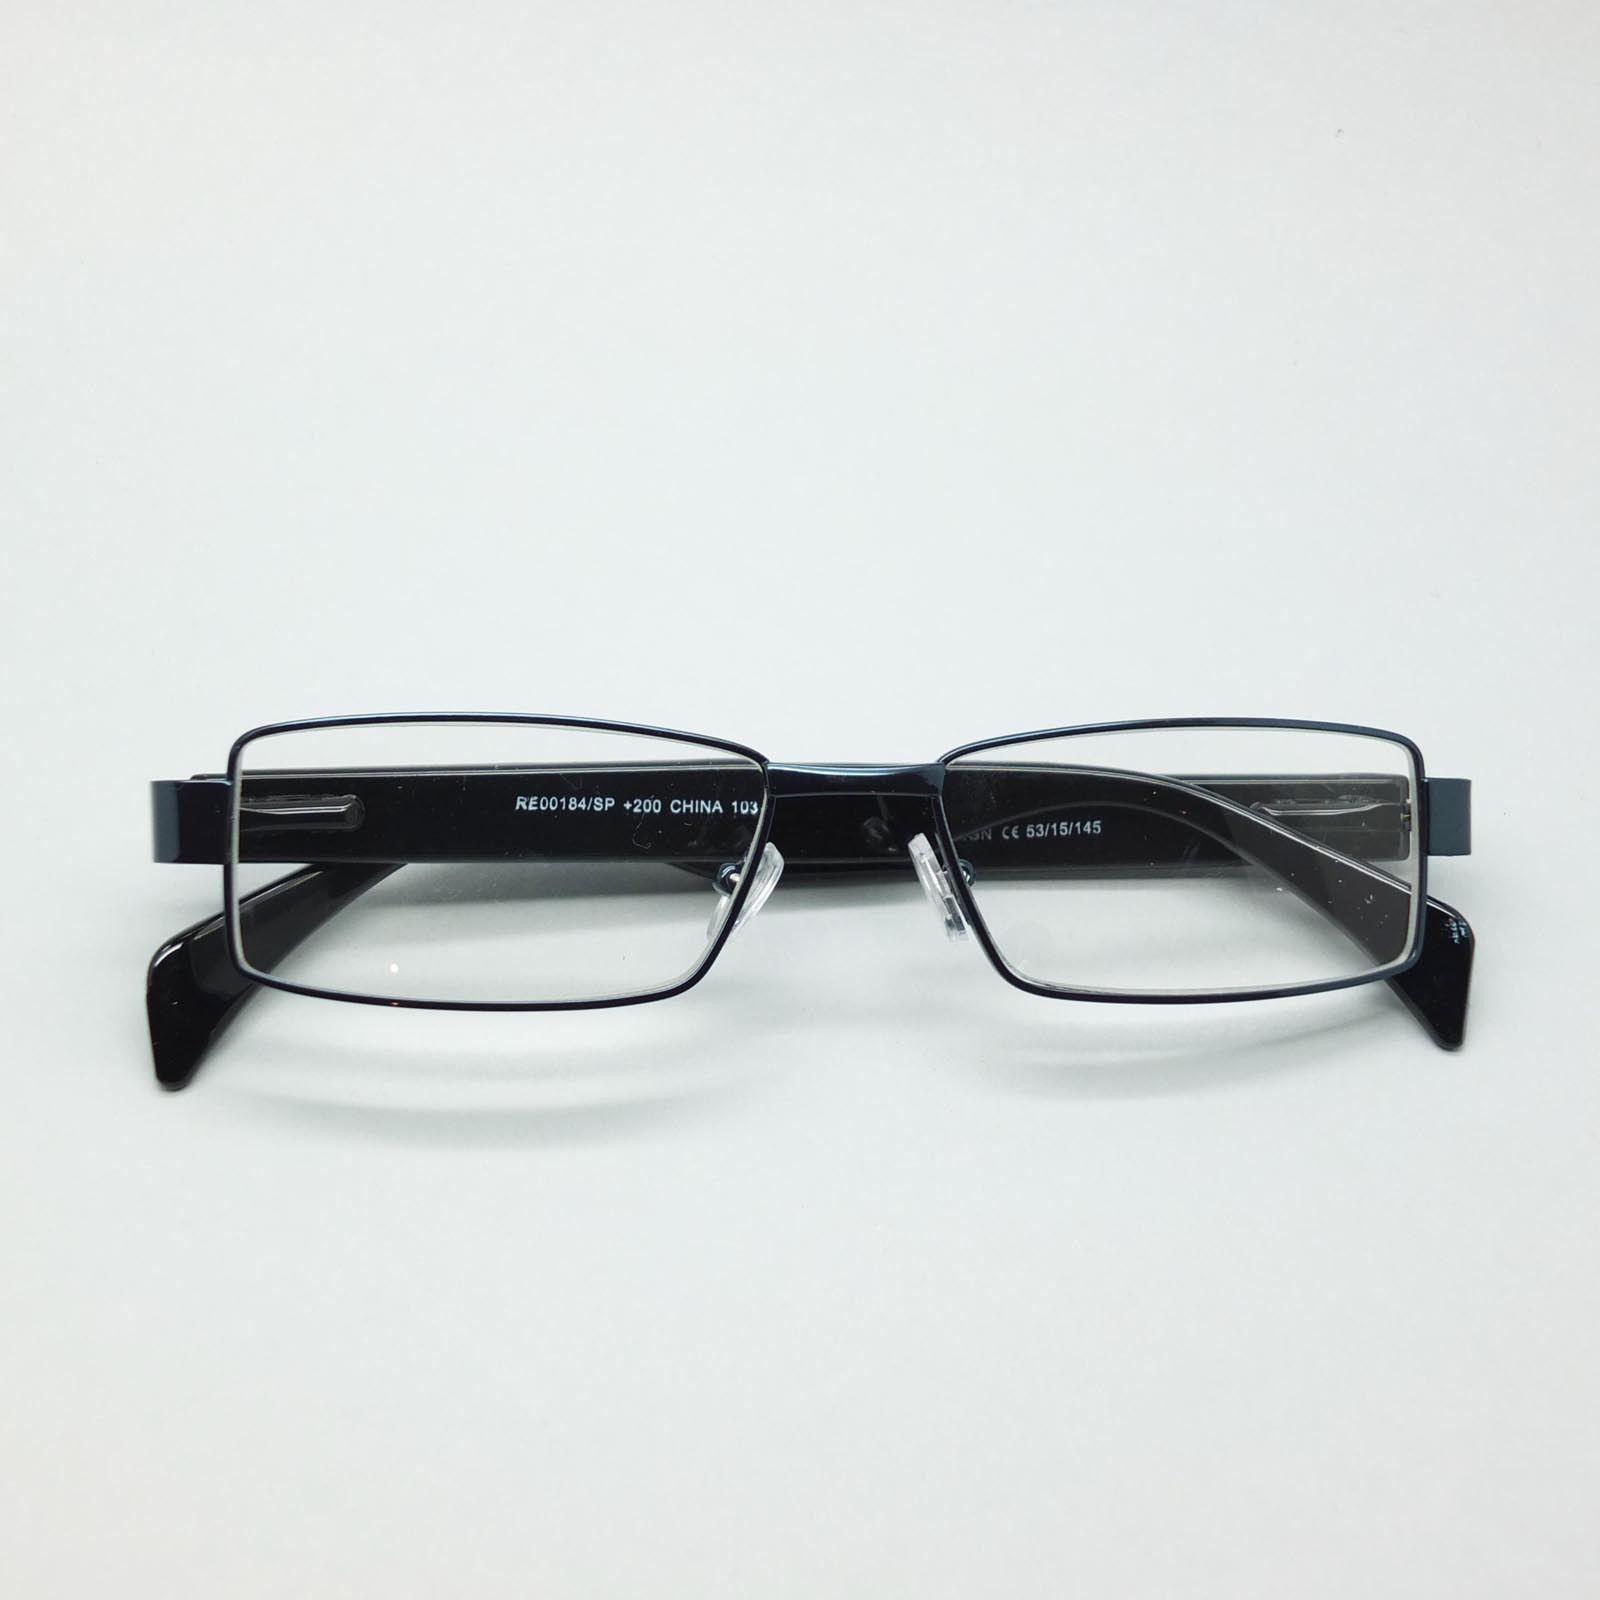 Reading Glasses Super Hi Tech Metro Metal Frame Jazz Aqua Black Detail +2.75